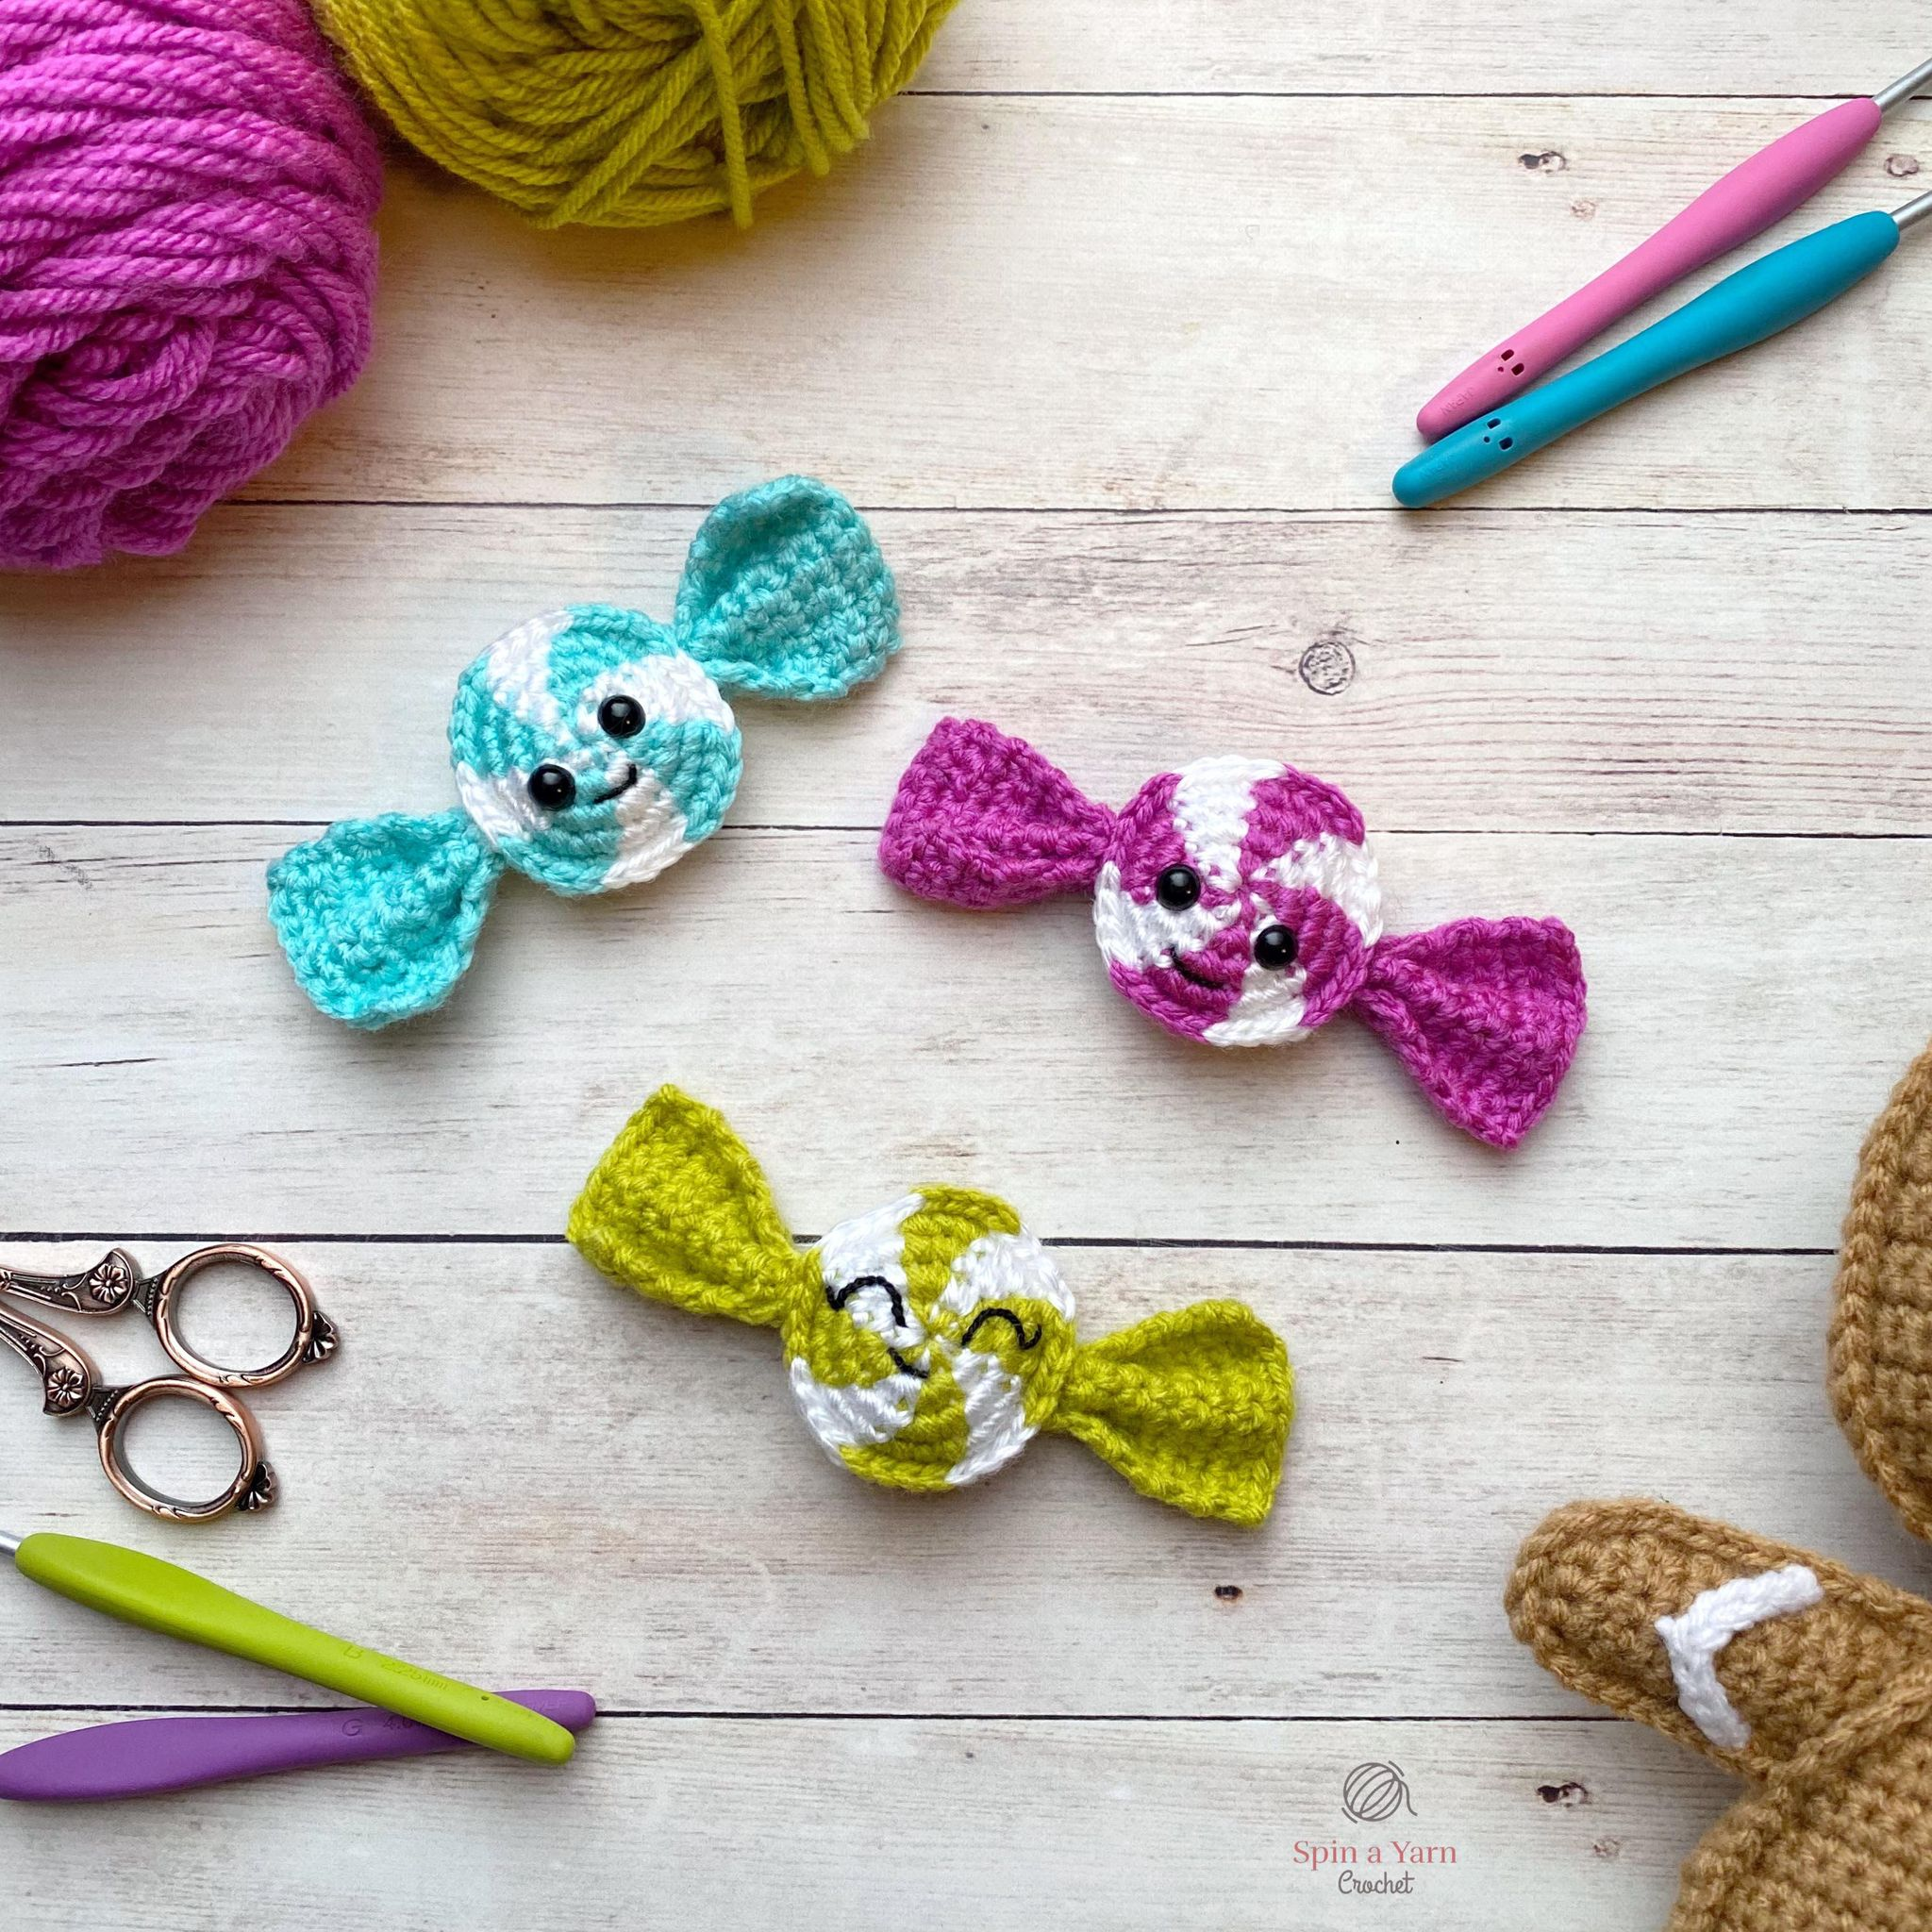 Crochet Patterns Archives Spin A Yarn Crochet